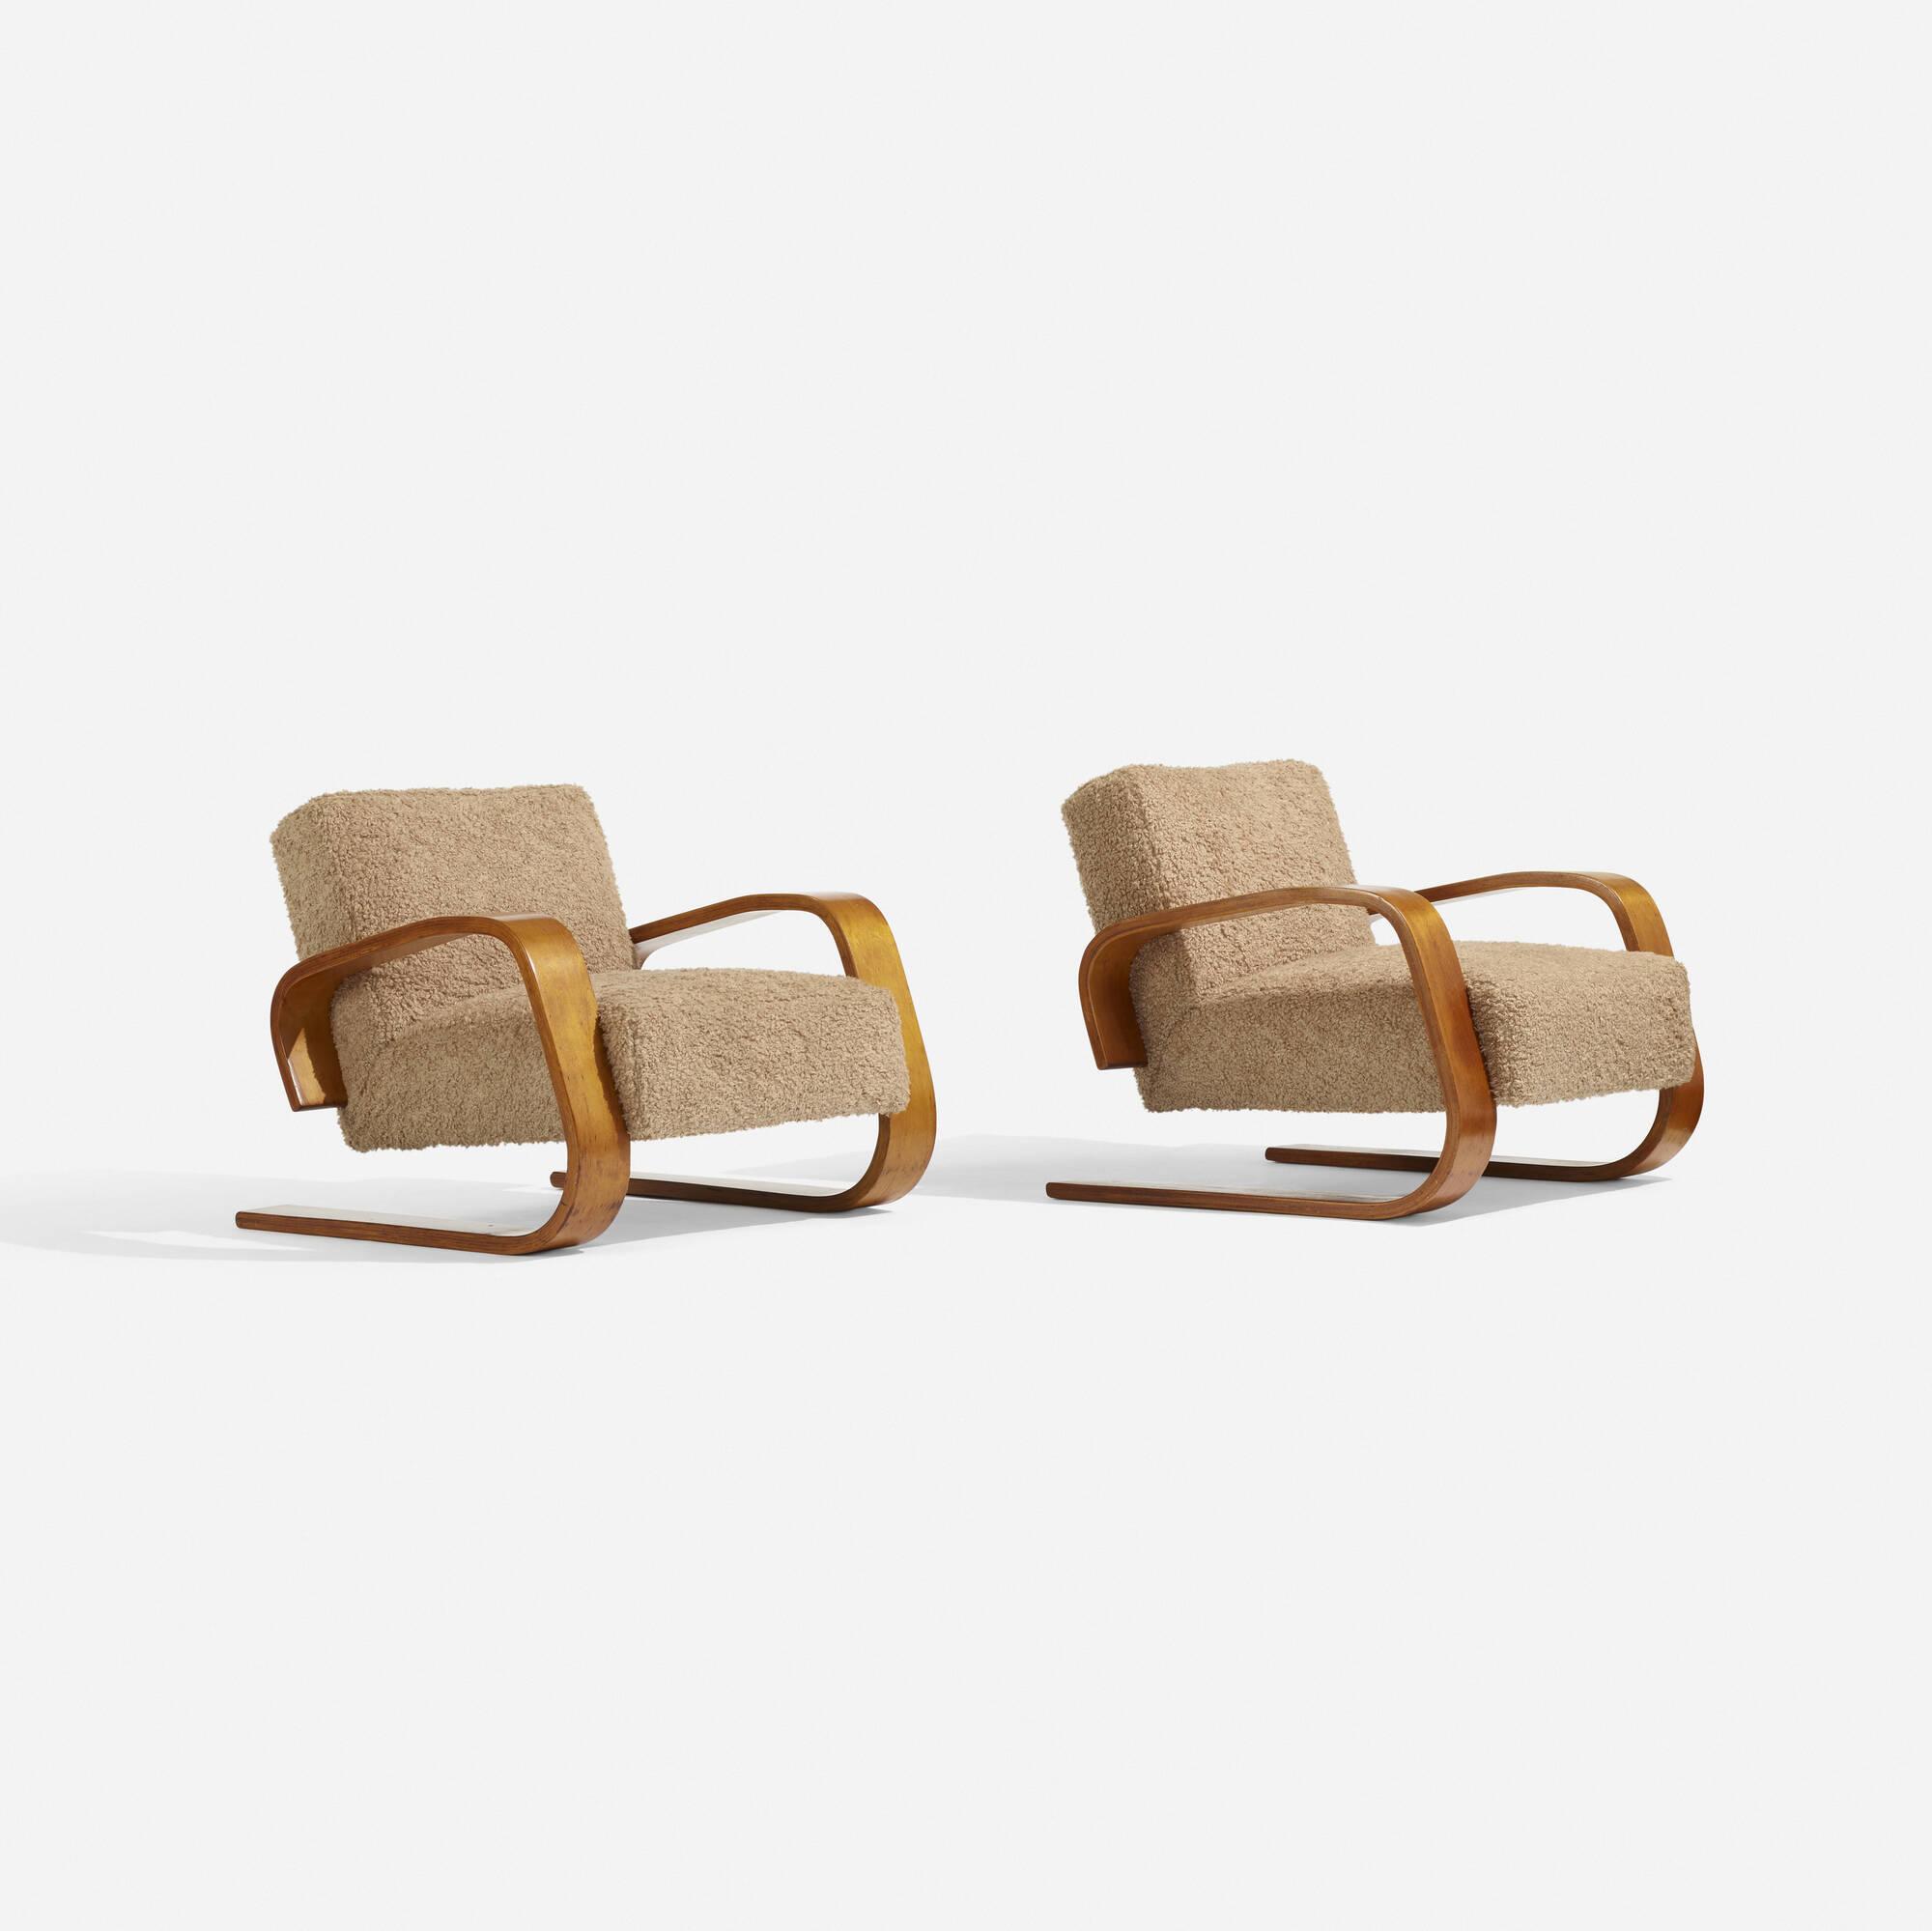 107: Alvar Aalto / Tank lounge chairs model 37/400, pair (3 of 3)